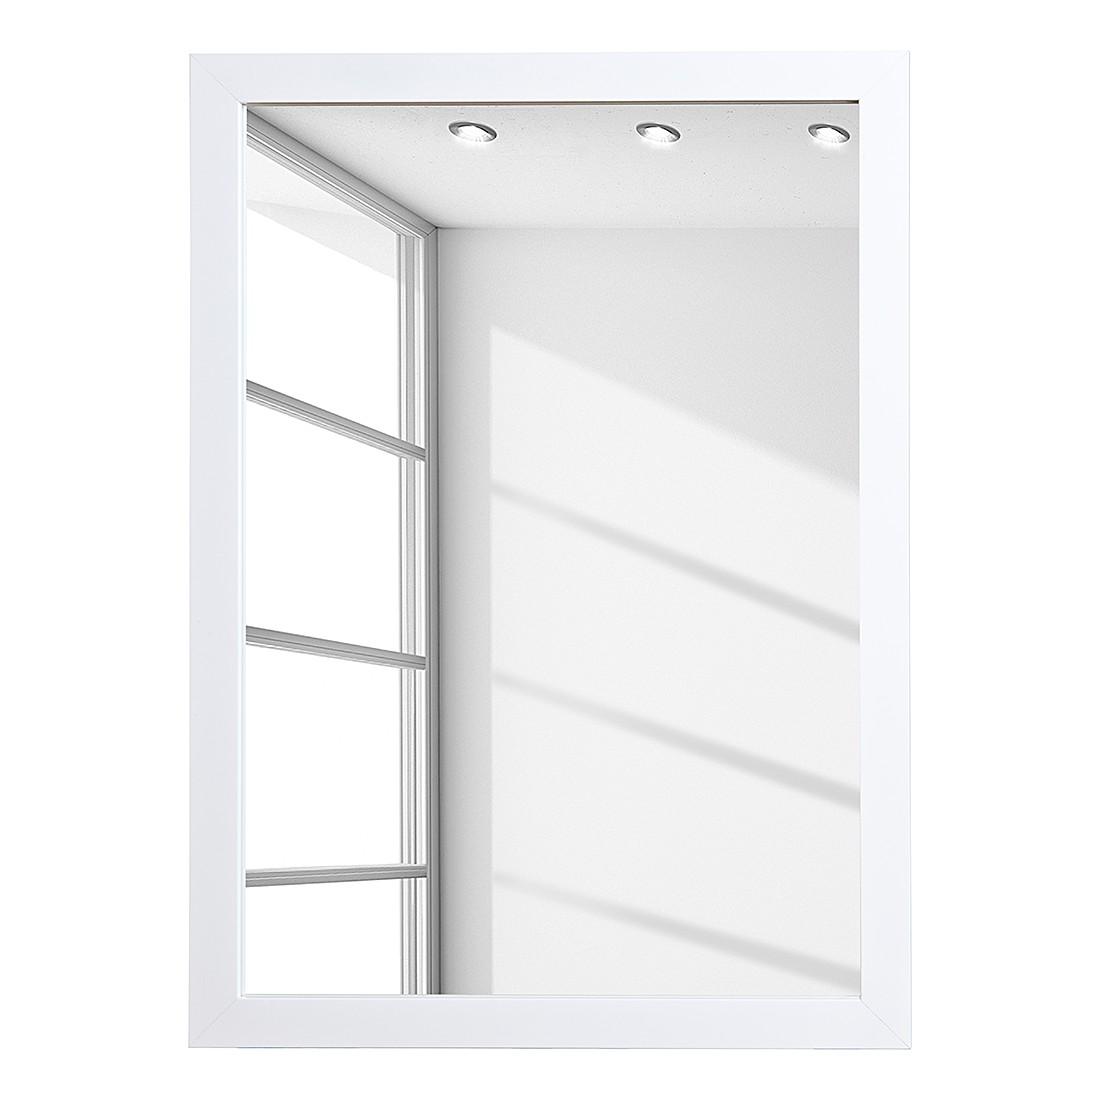 Spiegel Aja - 48x68cm - hoogglans wit, mooved